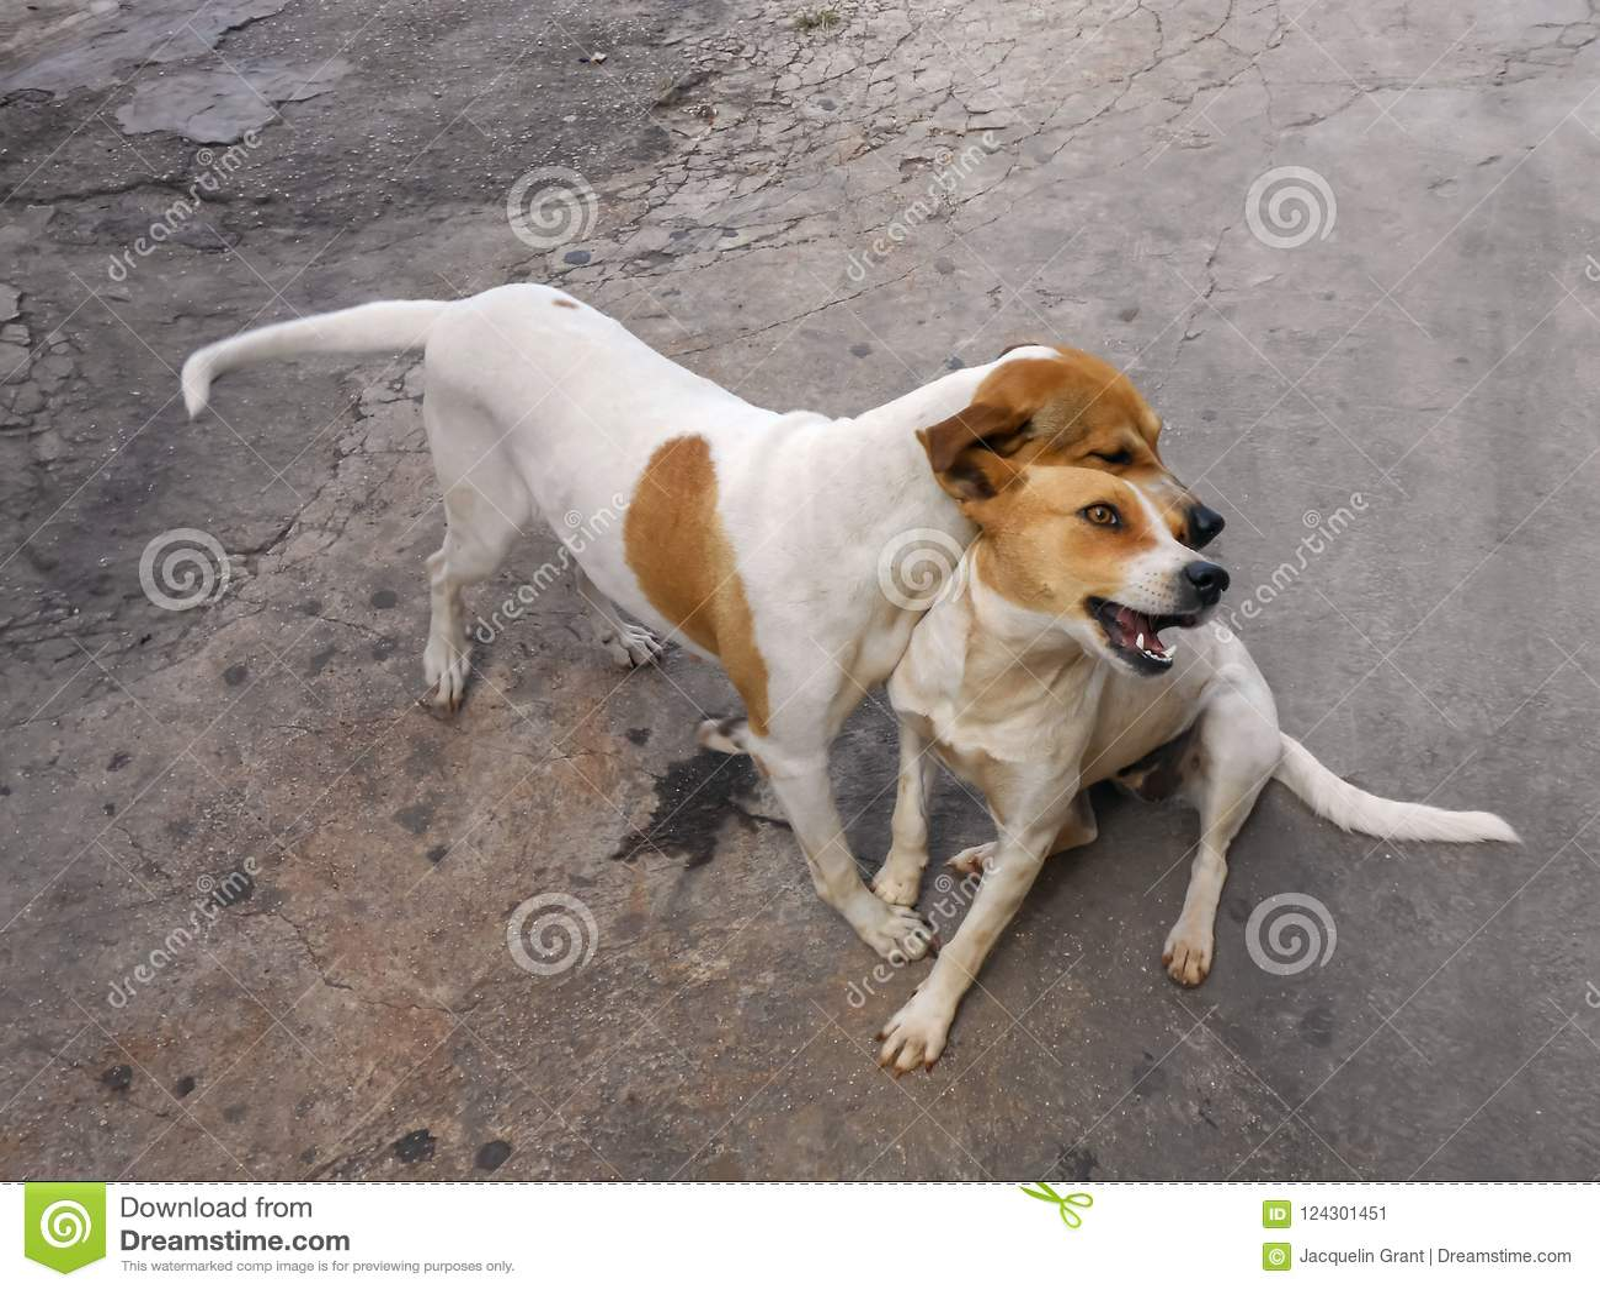 Dog`s Cheek to cheek Friendship